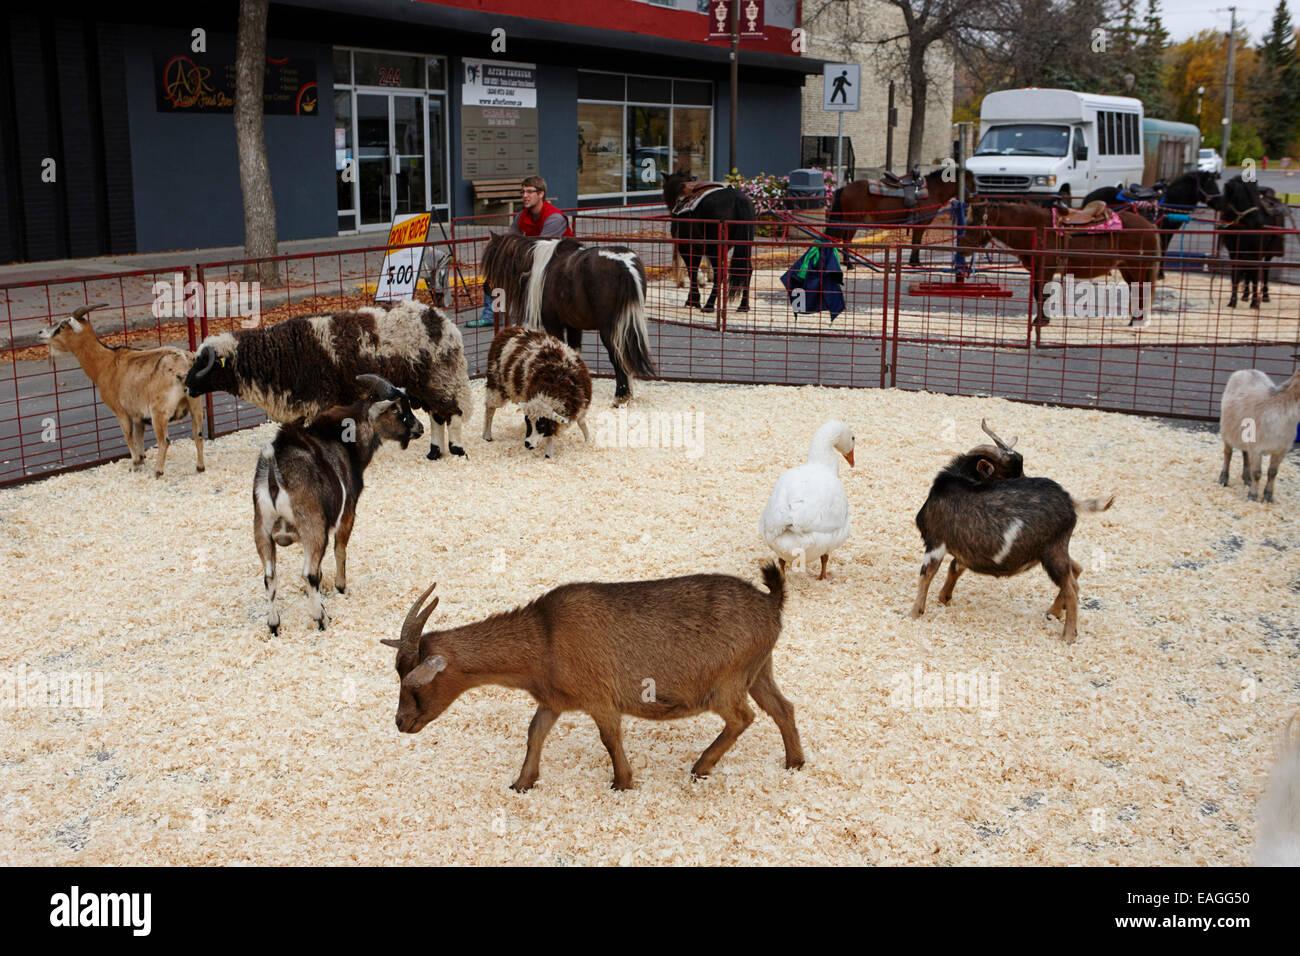 farmyard animals petting zoo at at fair swift current Saskatchewan Canada - Stock Image